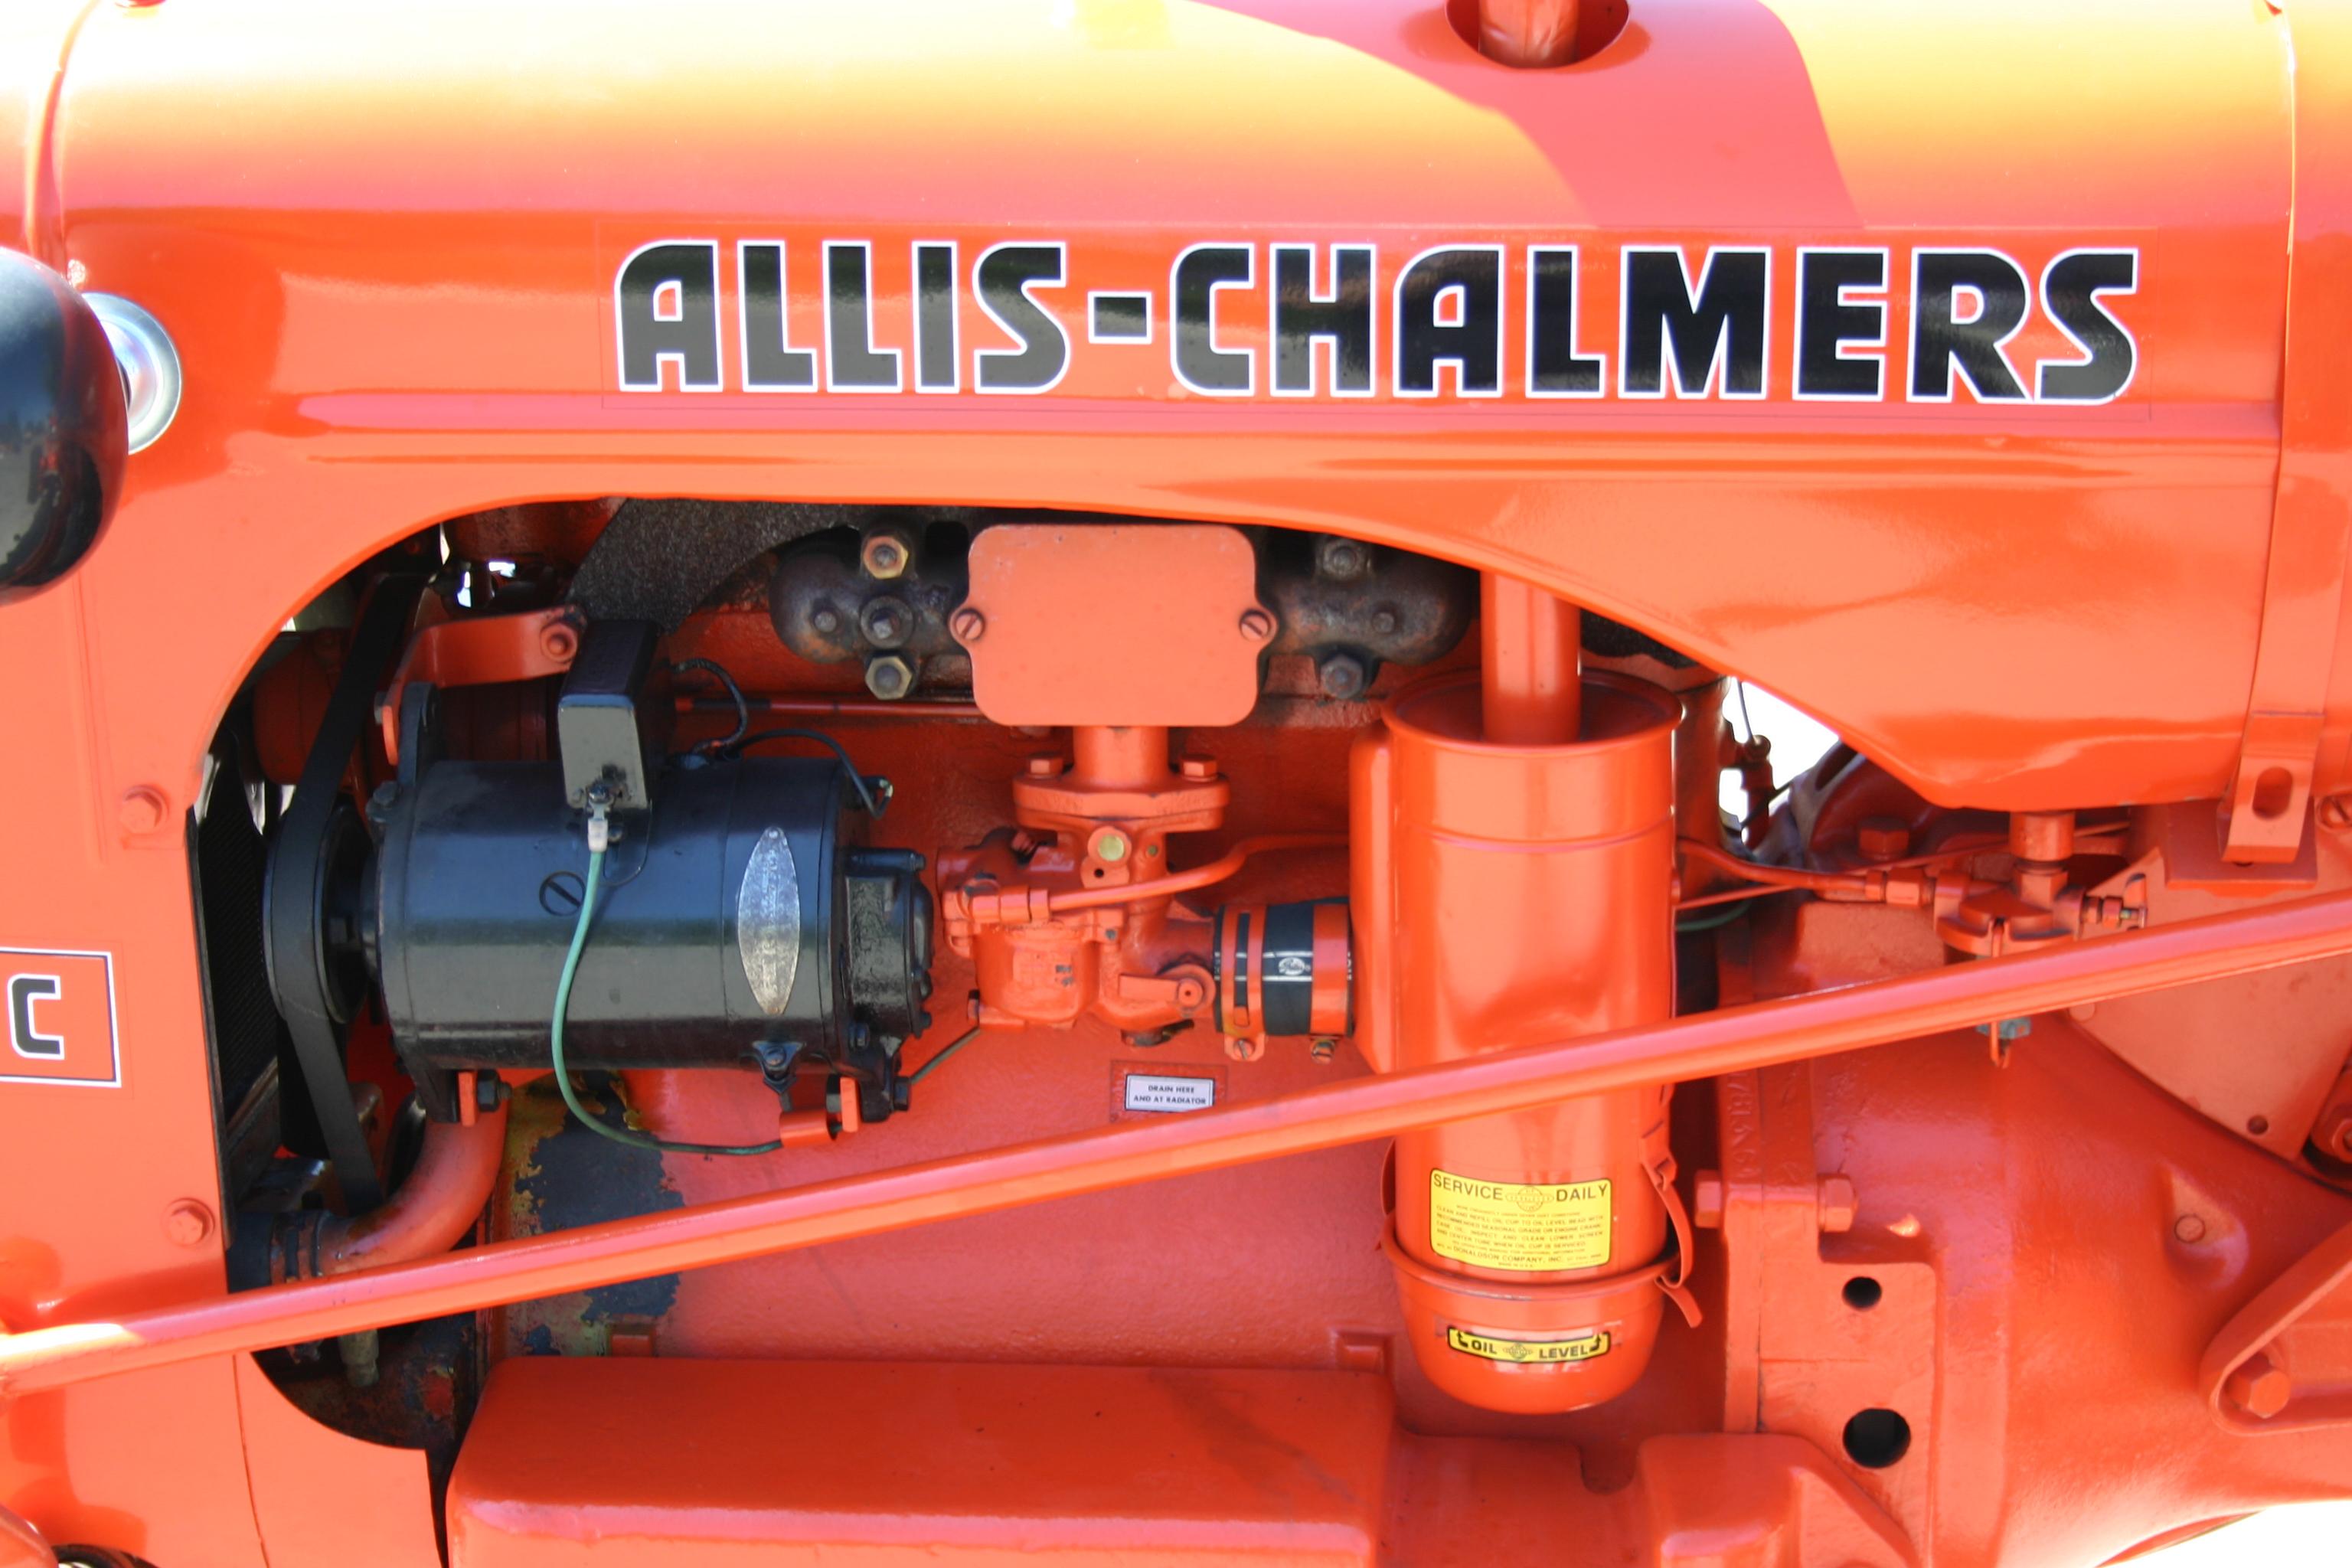 Allis-Chalmers-2-detail.